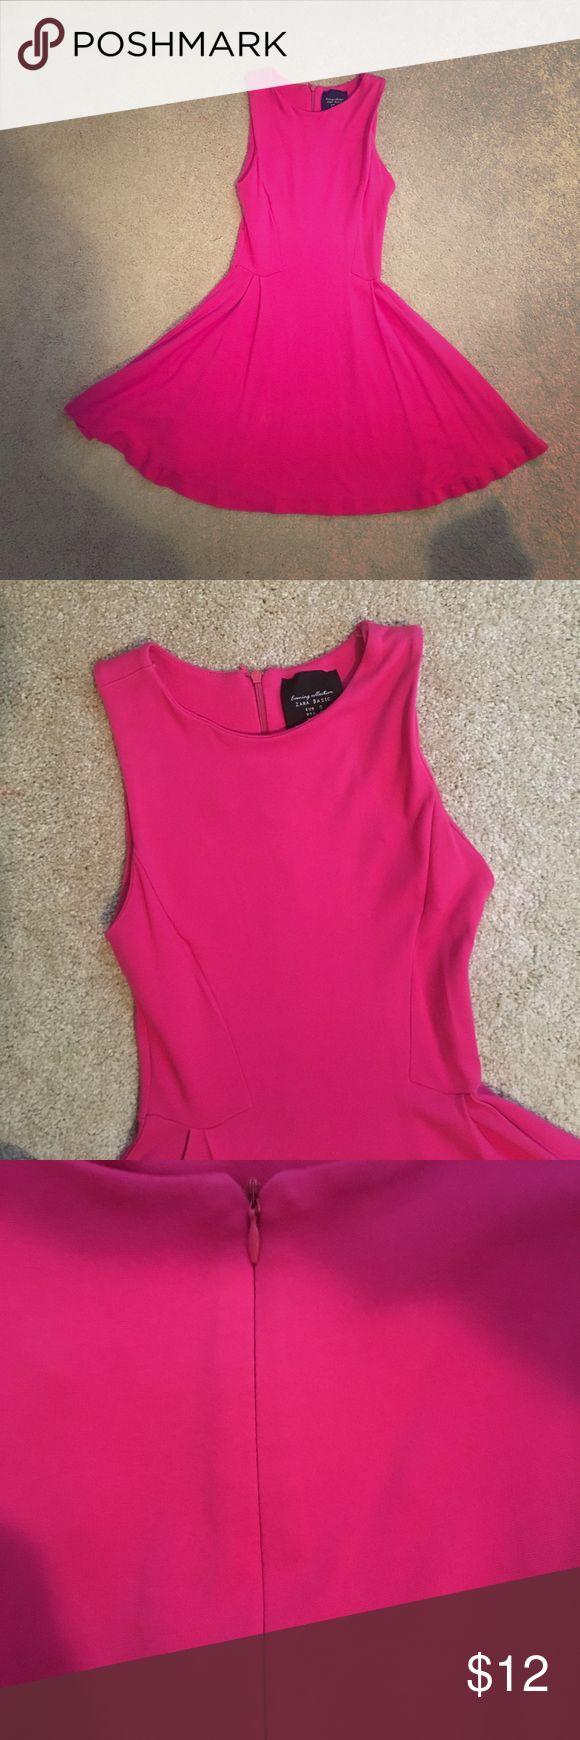 🎉FLASH SALE🎉 Zara Skater Dress Simple chic skater dress from Zara, high scoop neck, pink zipper back closure Zara Dresses Mini